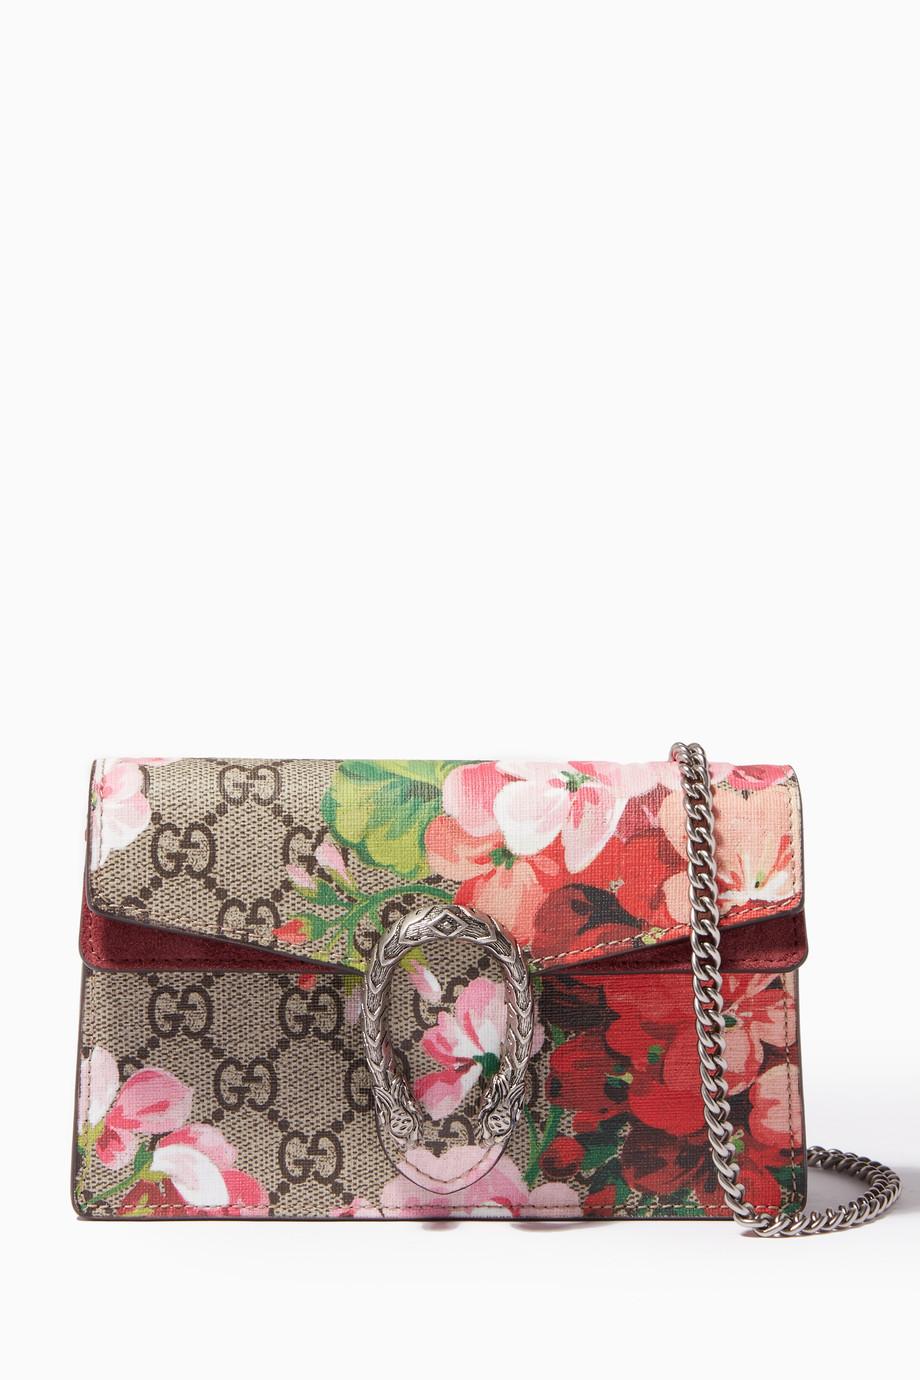 d917680cb Shop Gucci Pink Beige Super Mini Dionysus GG Supreme Shoulder ...